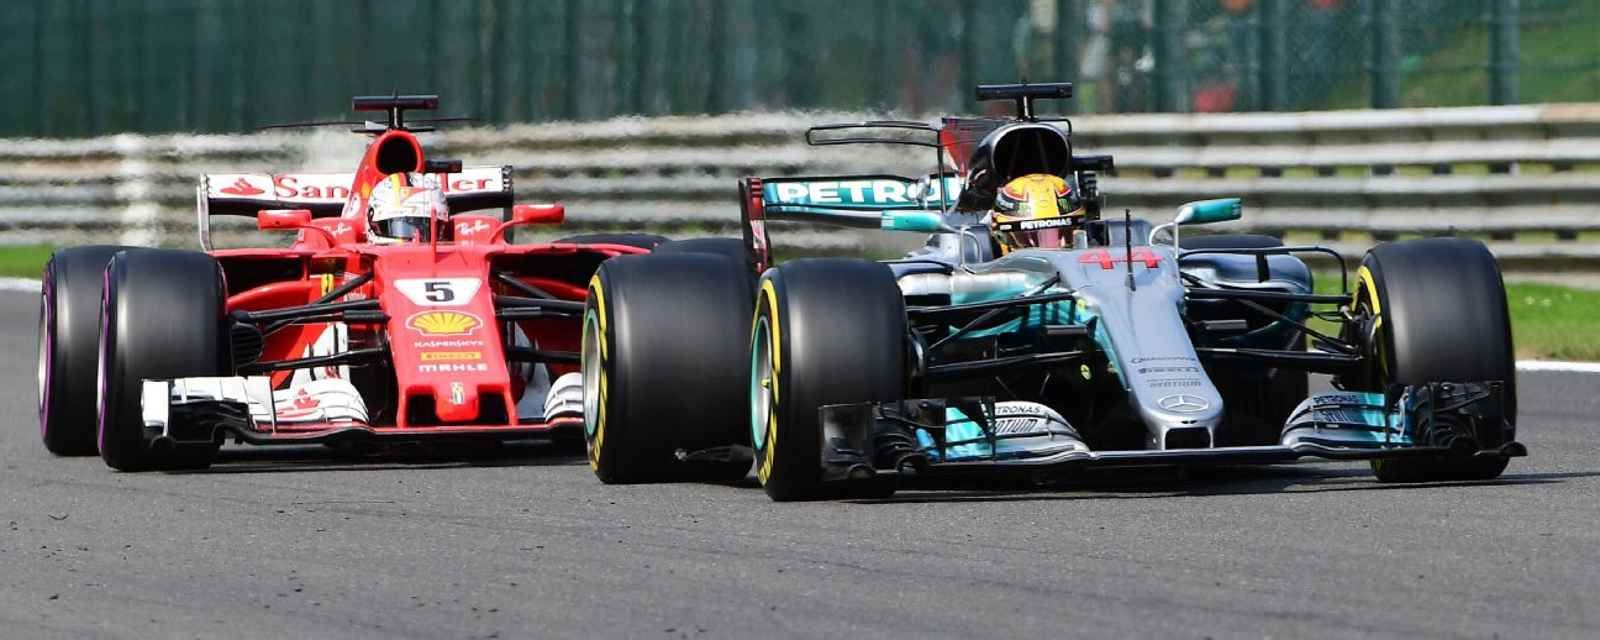 formula 1 news live grand prix updates videos drivers and results rh pinterest com